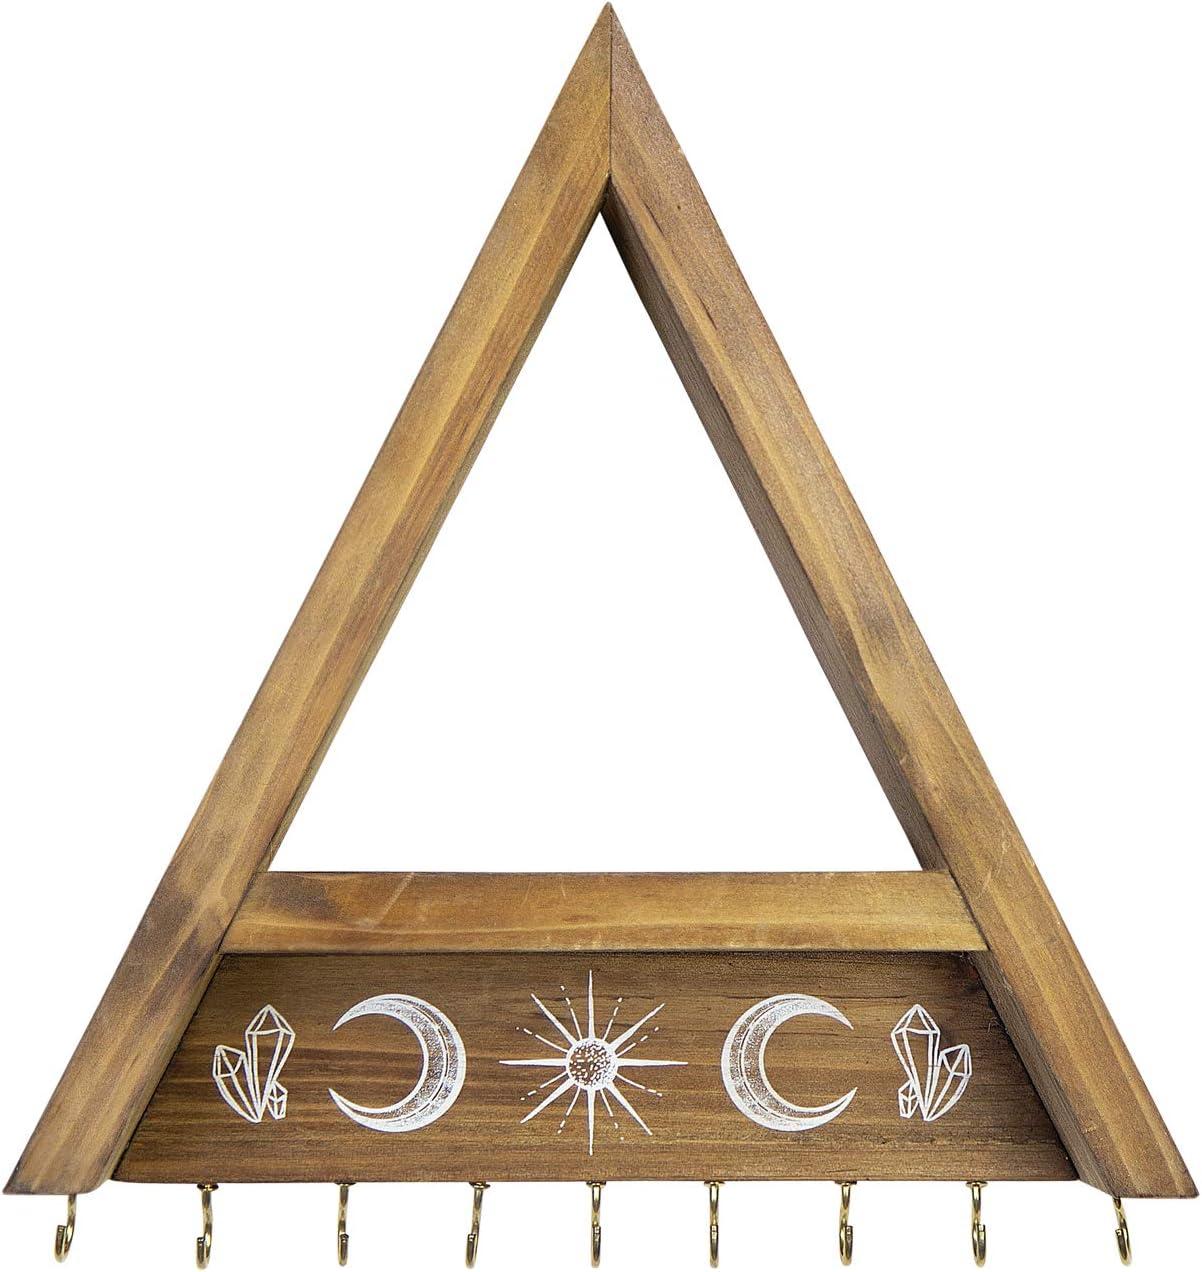 Stratton Home Decor Wooden Triangle Shelf Coat Hooks, Small, Brown